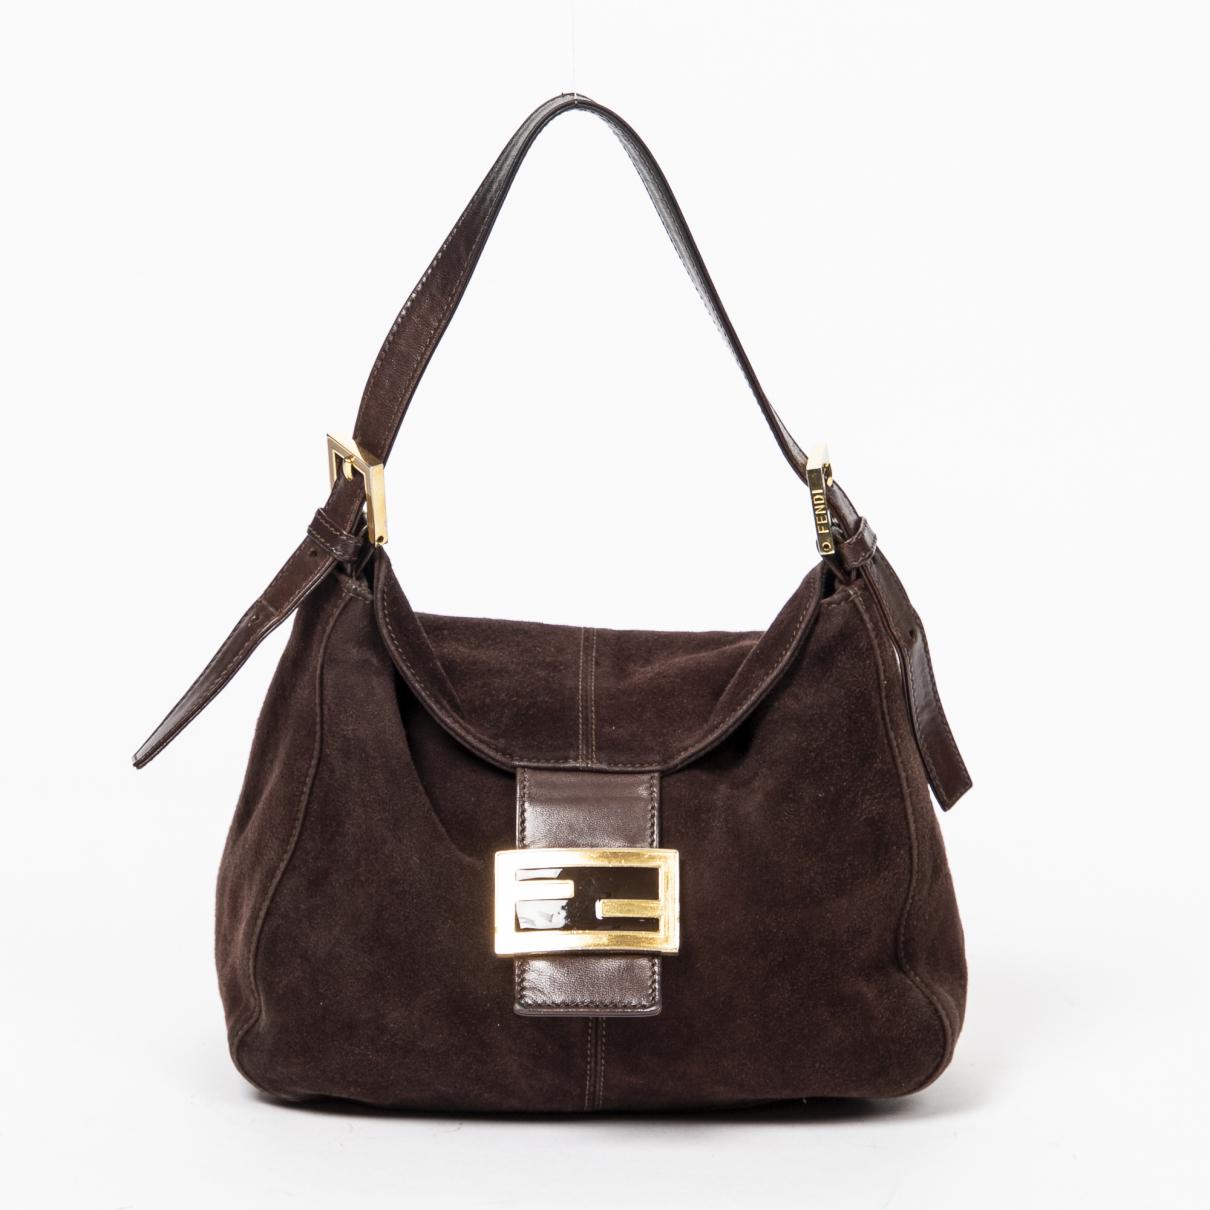 Fendi Mamma Baguette  Handtasche in  Braun Leder